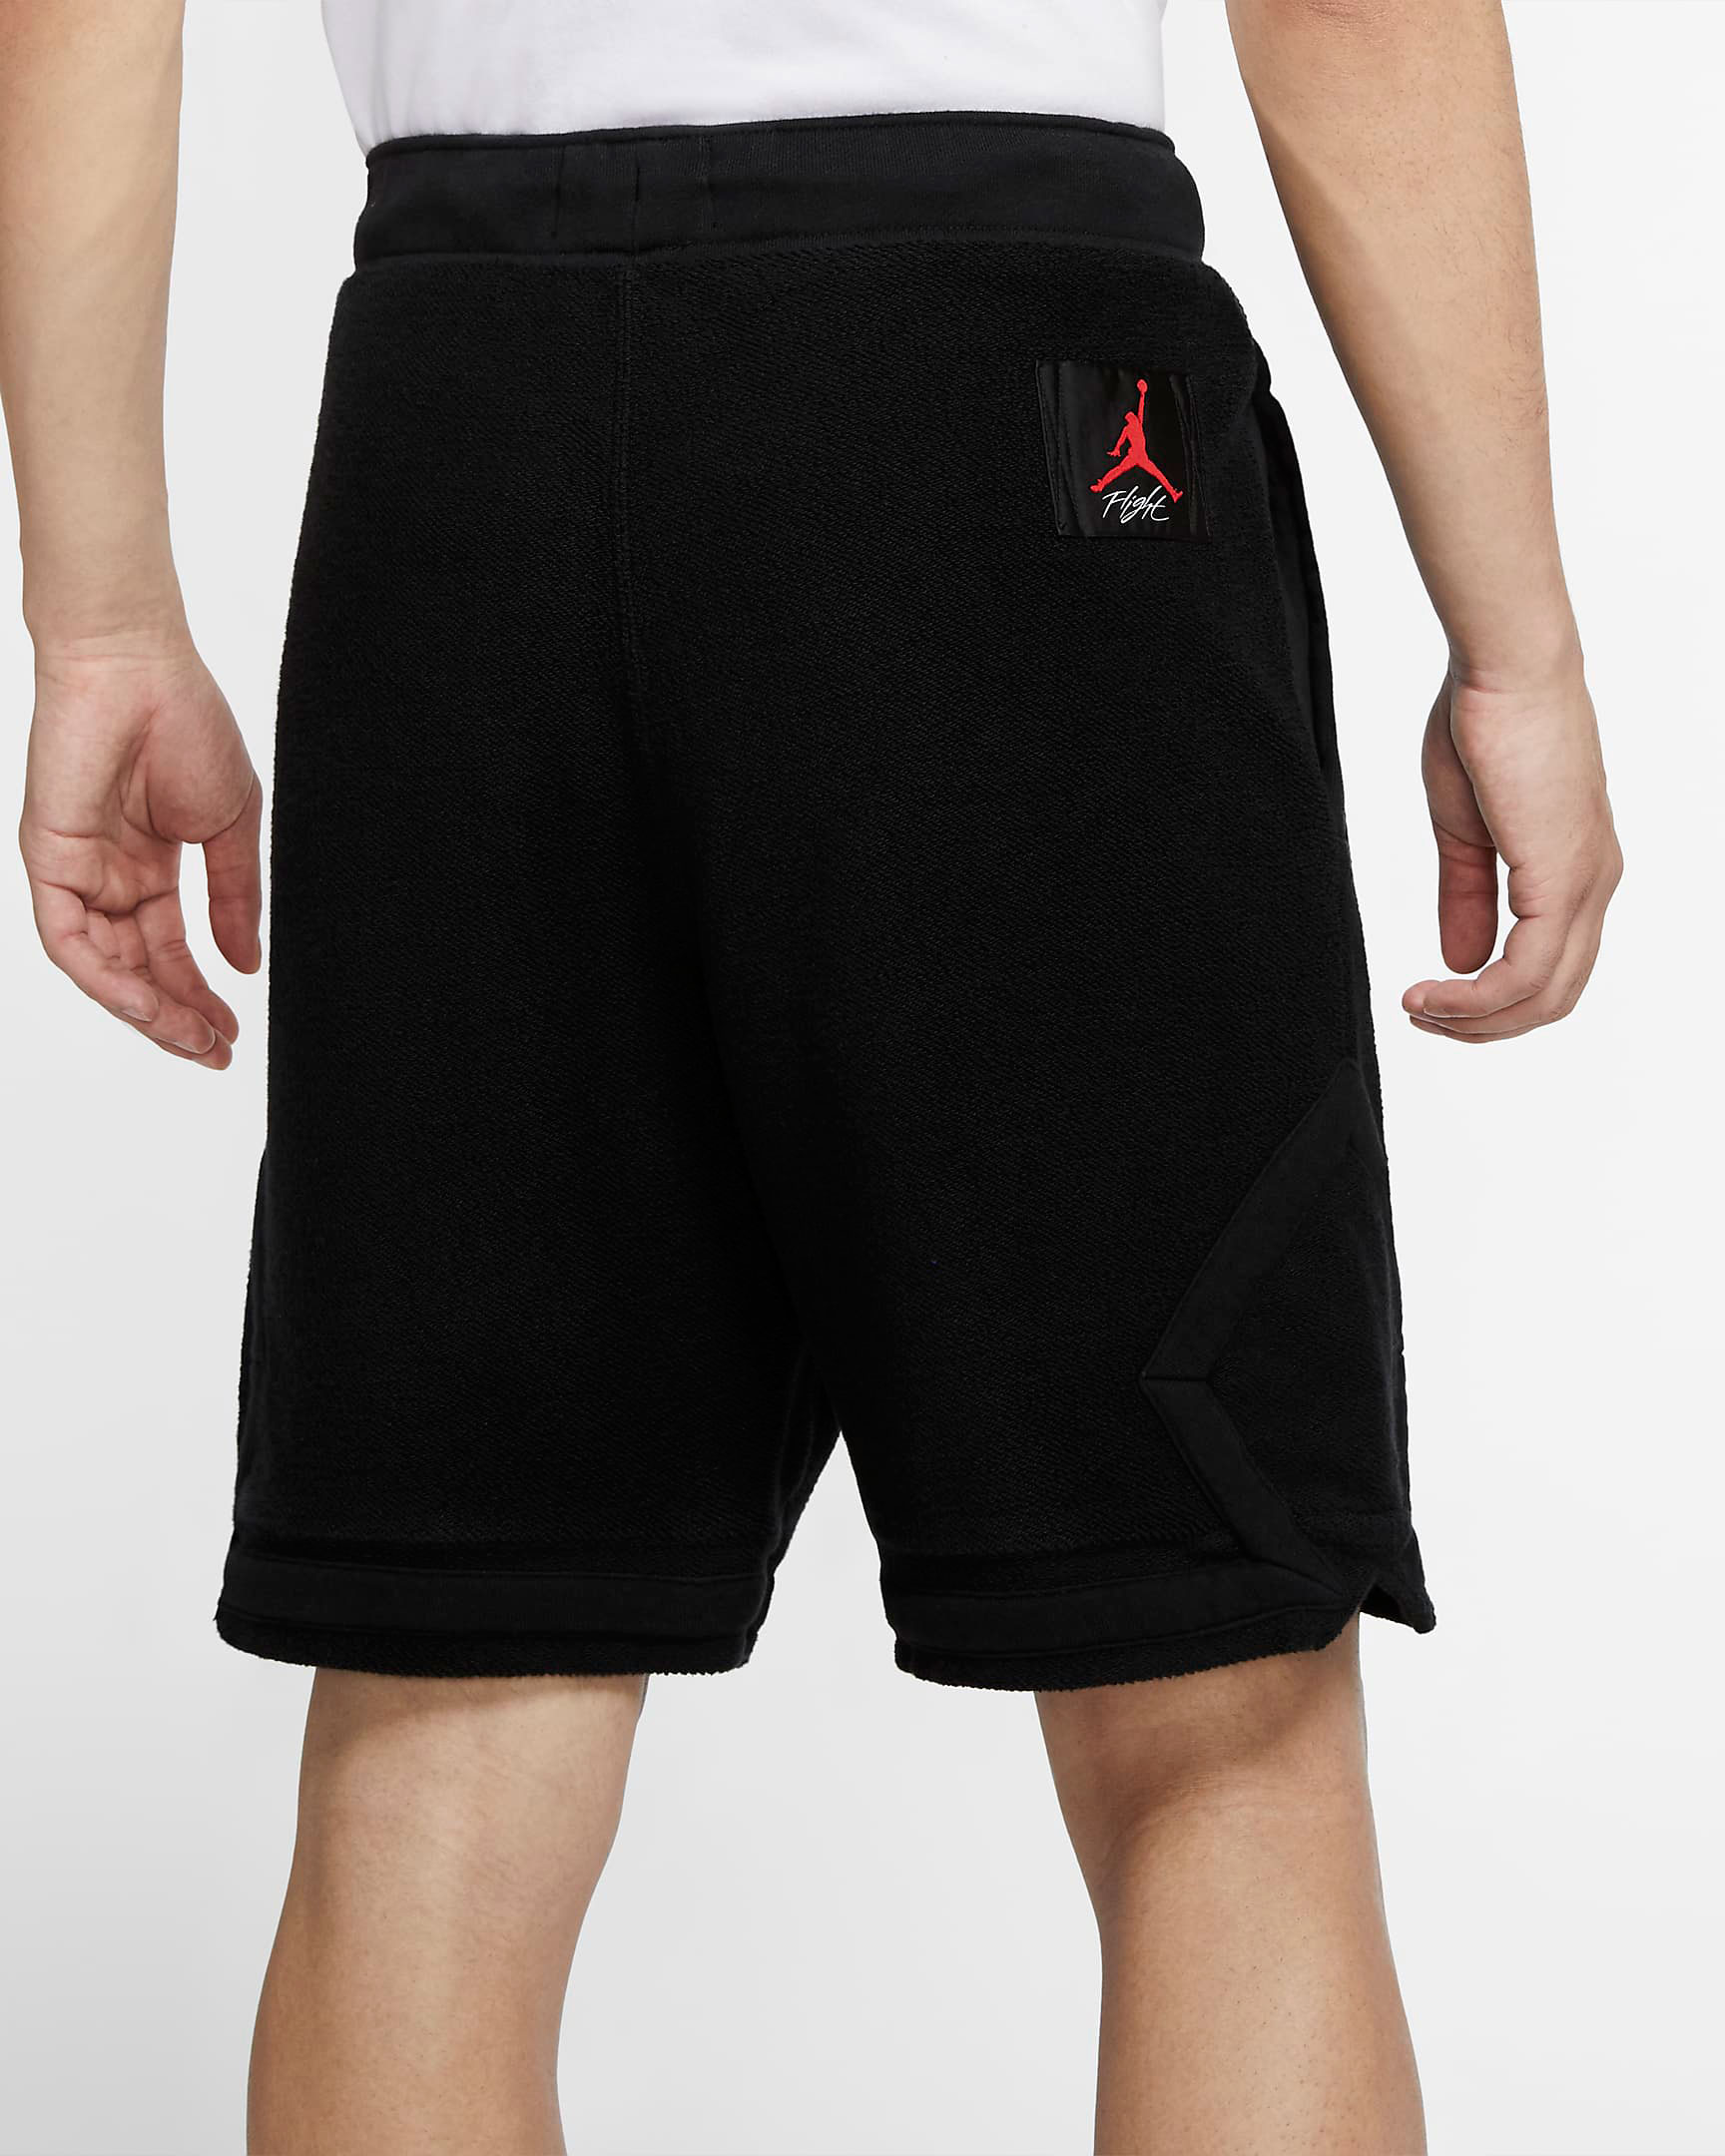 jordan-flight-shorts-black-red-fall-2020-2